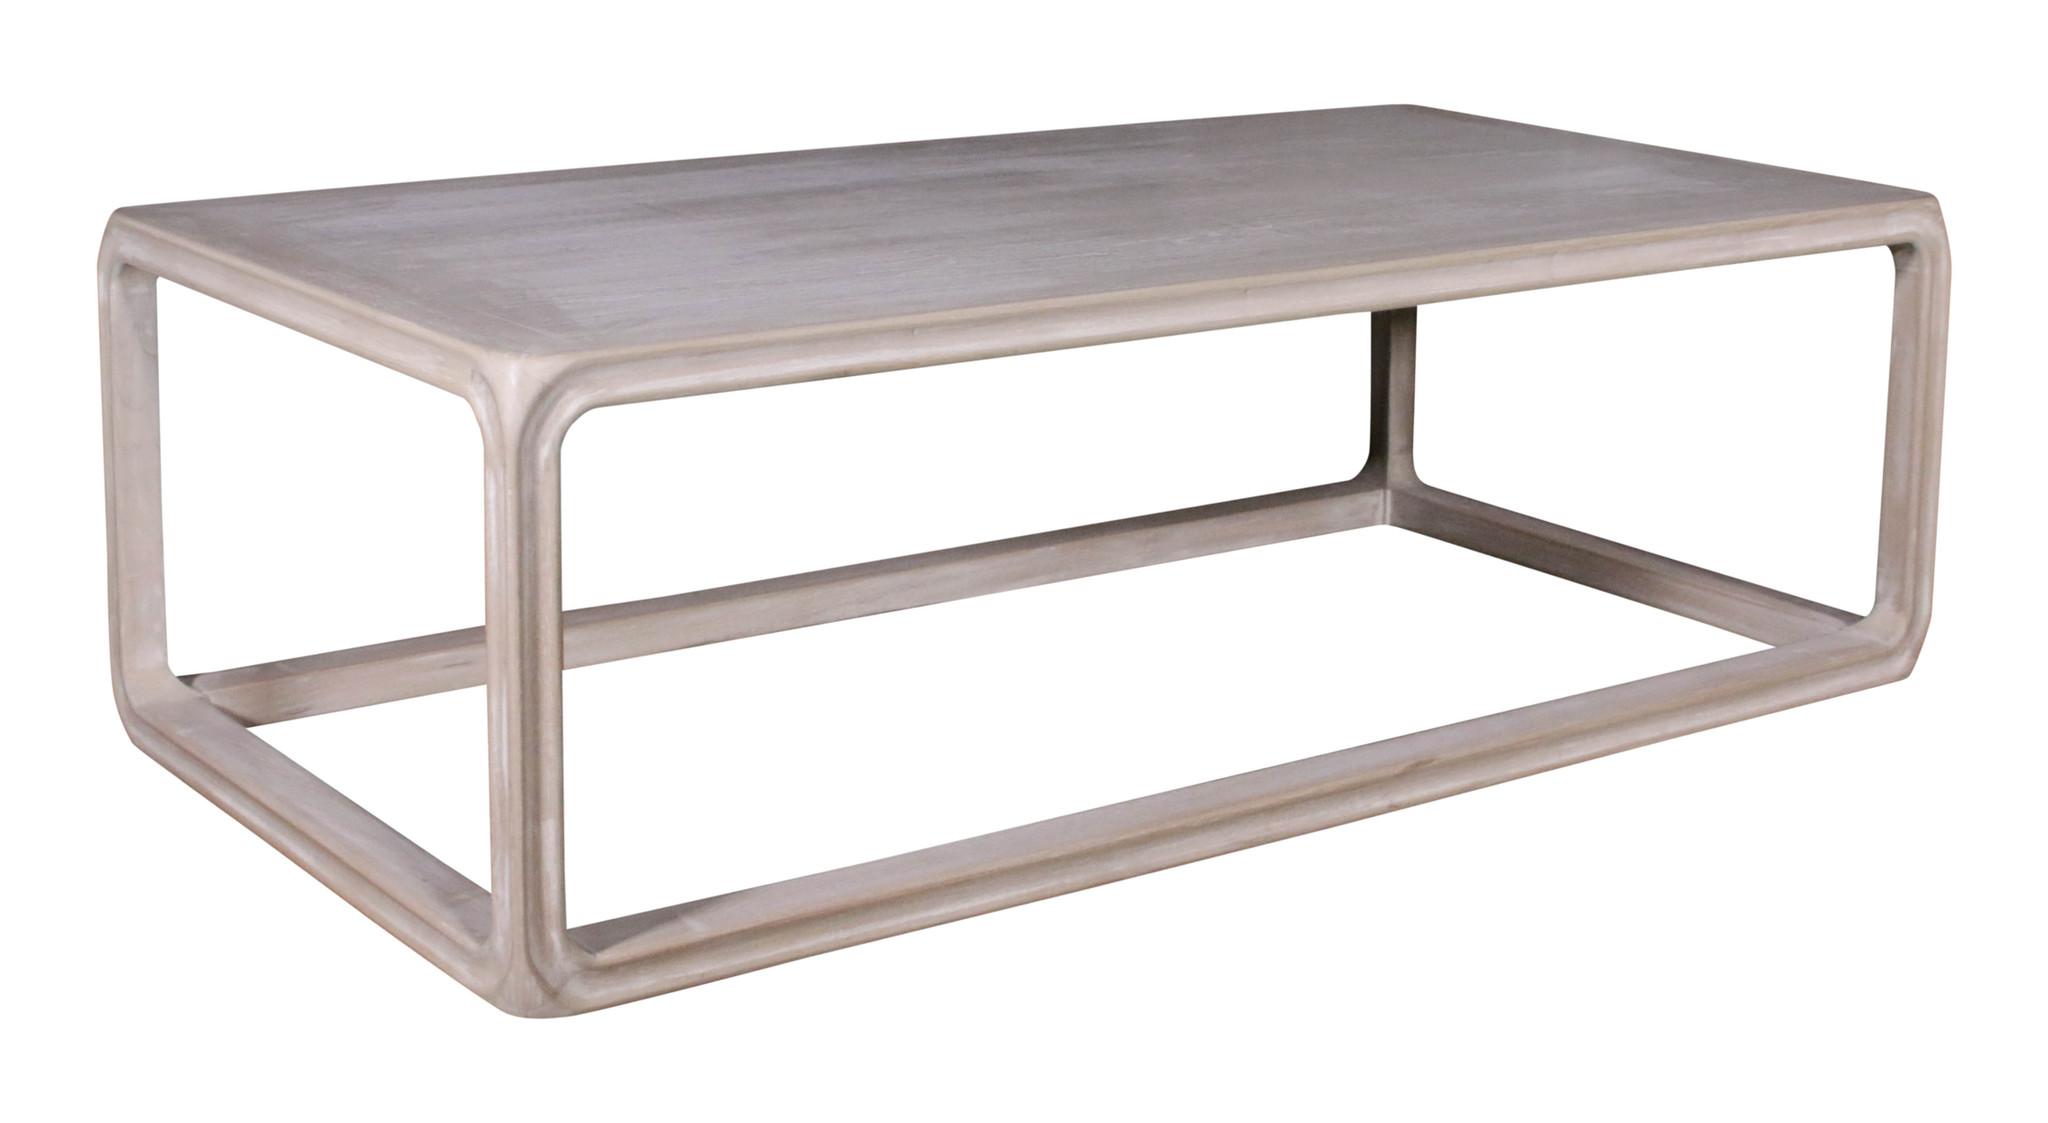 Brilliant Reclaimed Peking Coffee Table White Wash Lamtechconsult Wood Chair Design Ideas Lamtechconsultcom